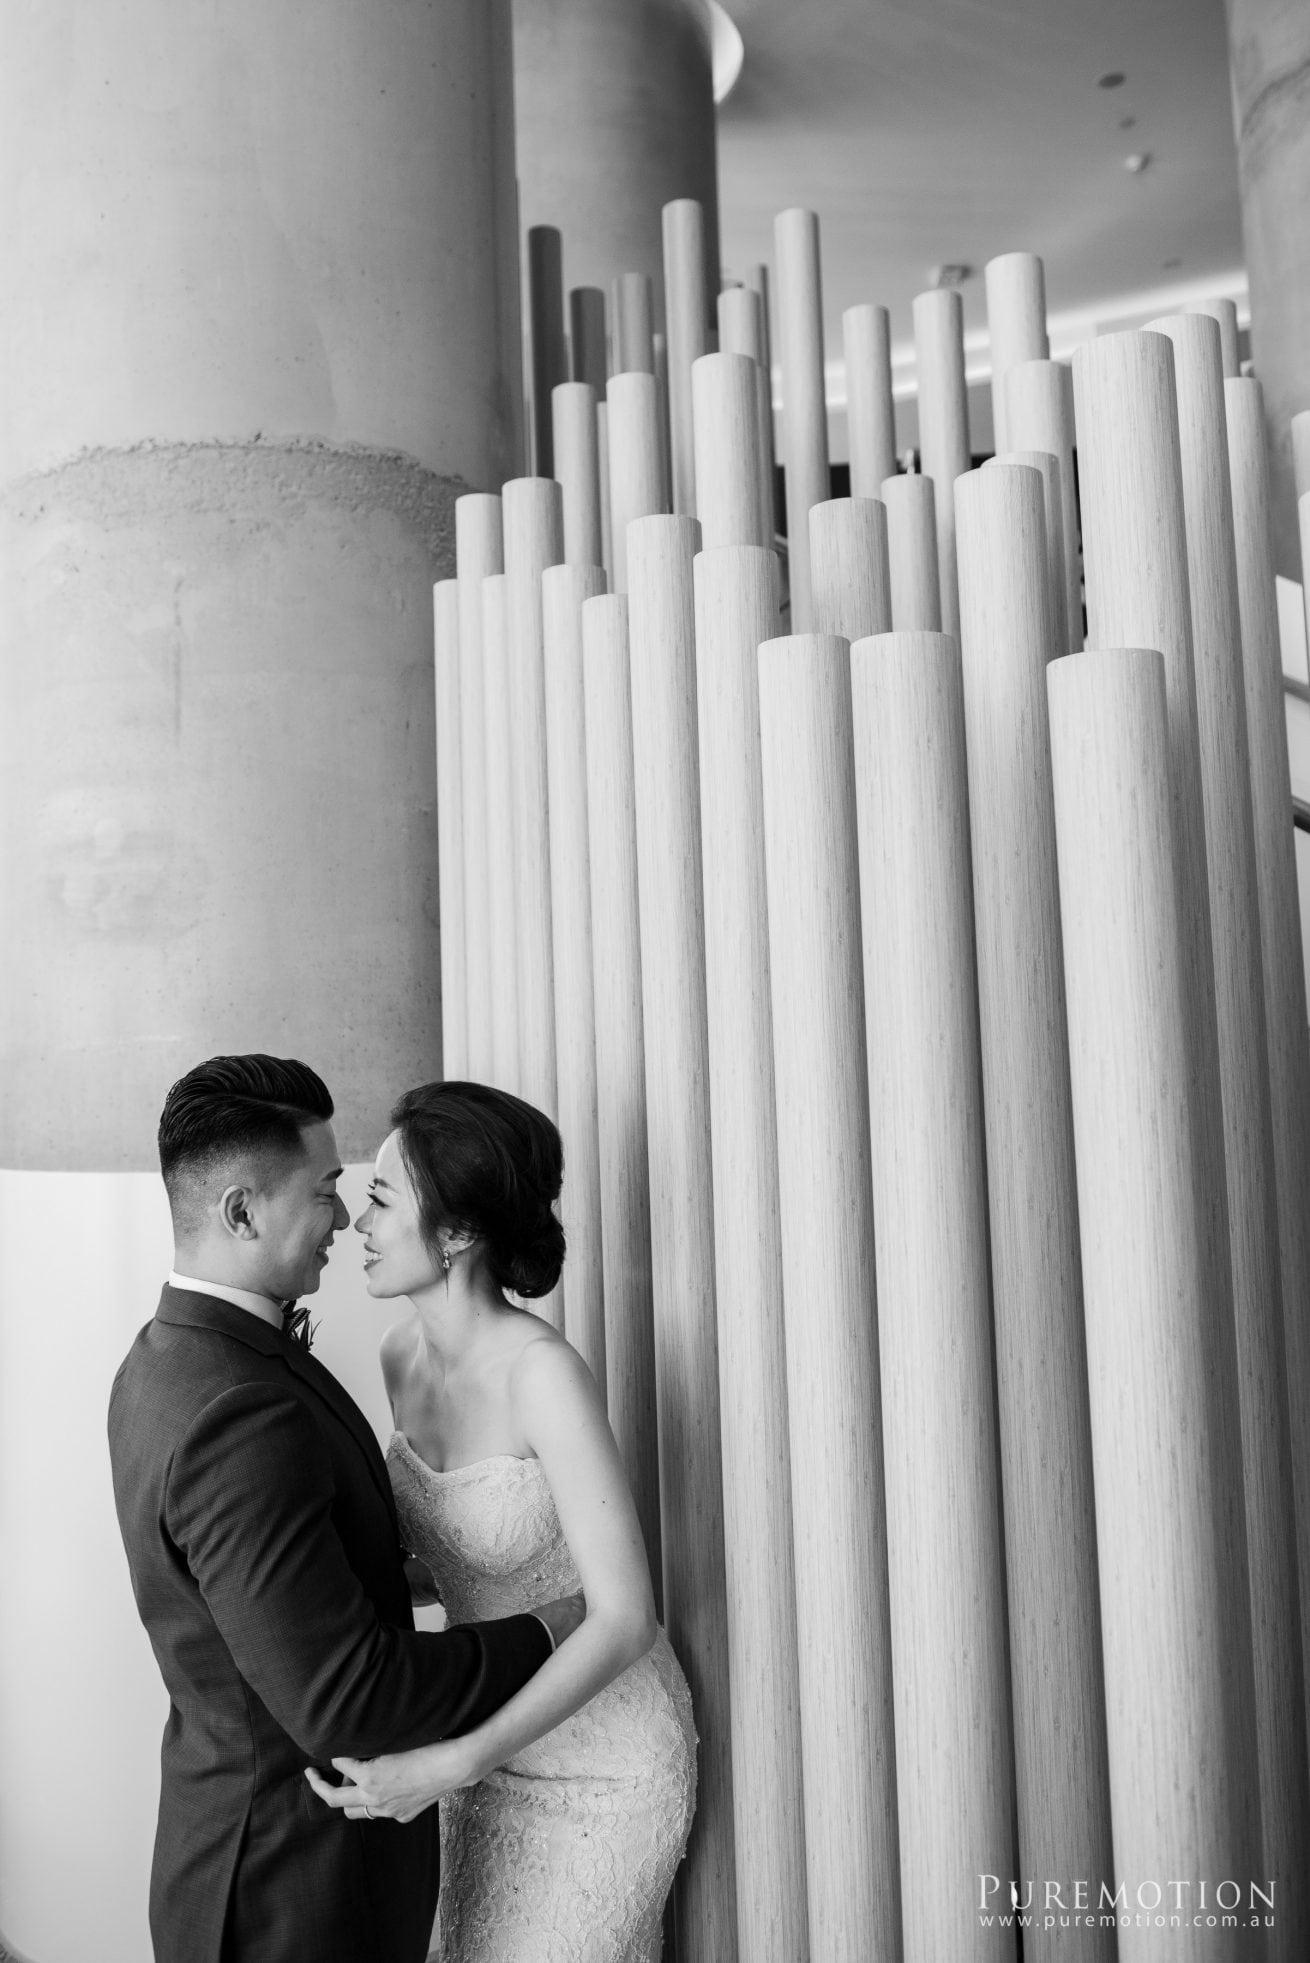 Puremotion Wedding Photography Alex Huang Brisbane W Hotel076